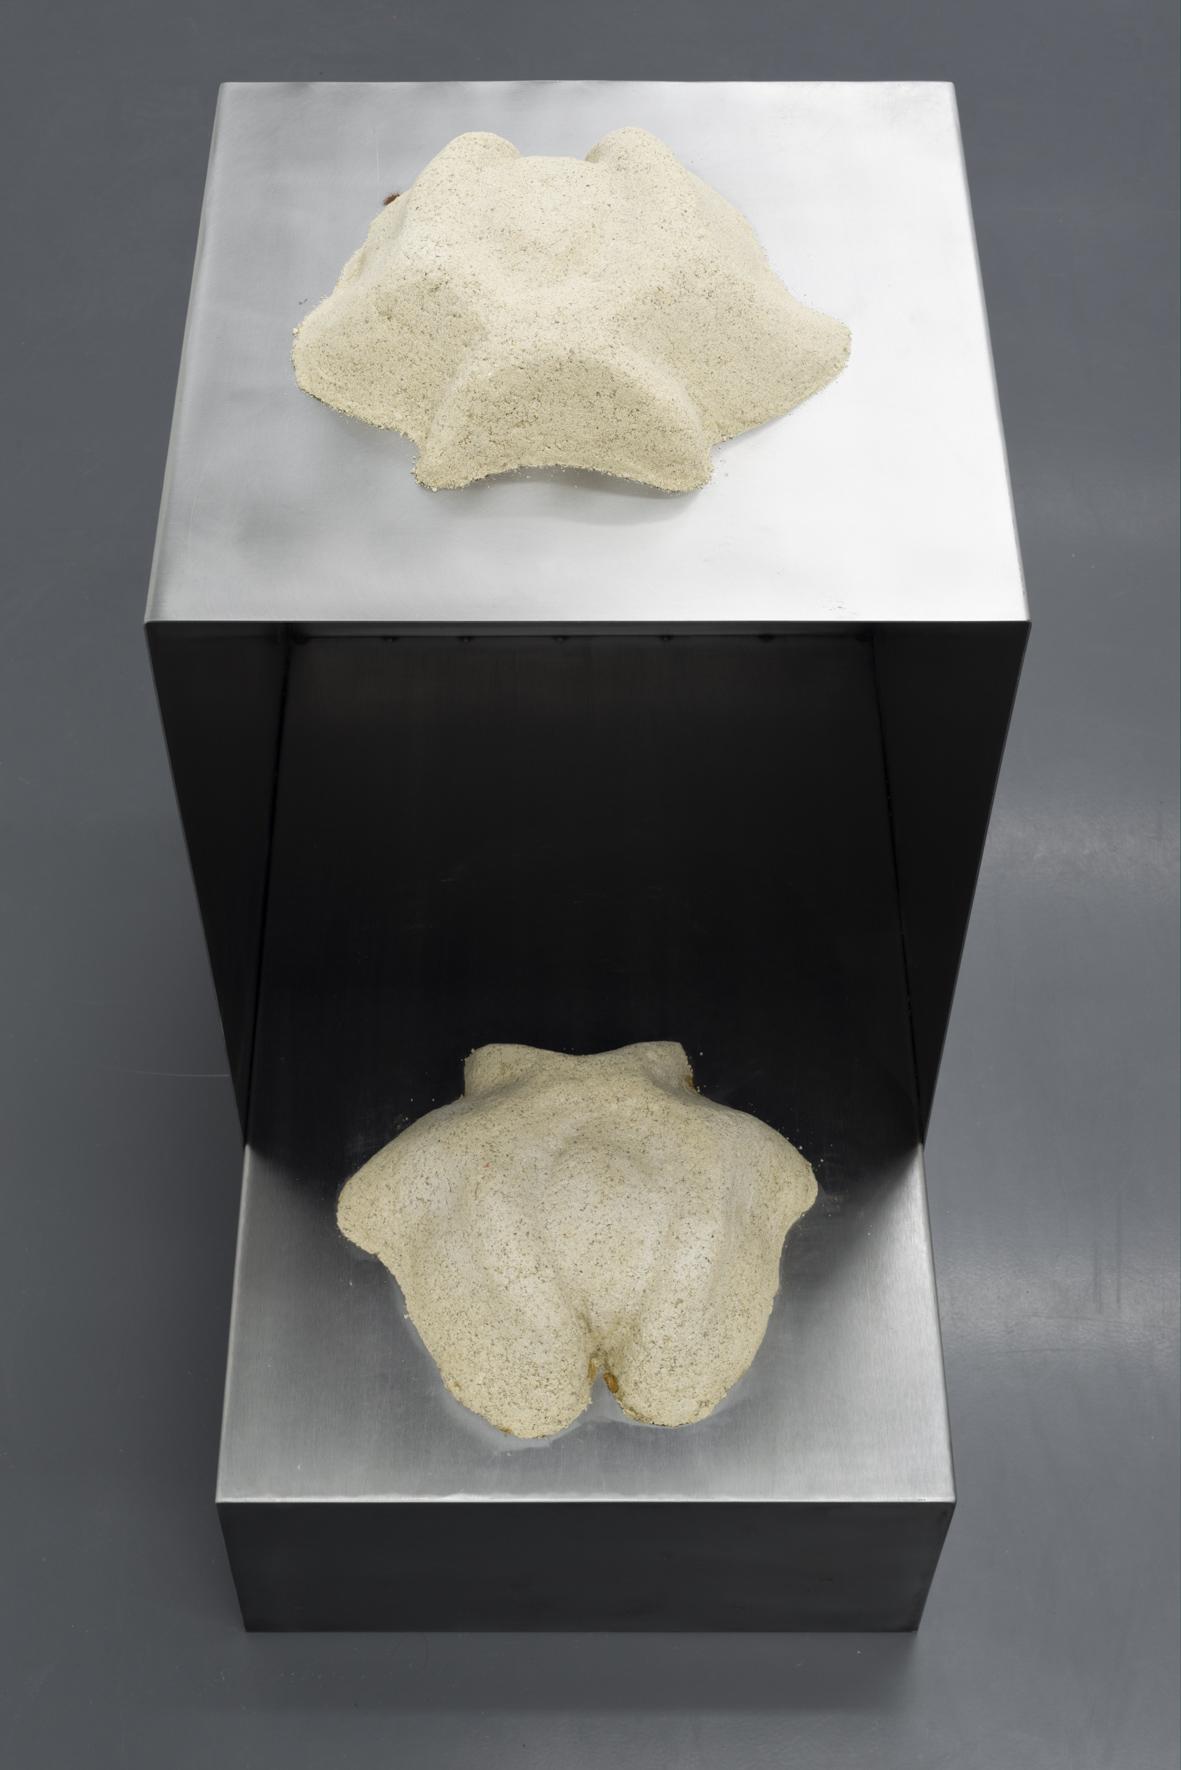 Lena Henke, Eure Frankfurter Küche, 2016, Metal, sand, silicone, fibreglass, epoxy resin, rubber, 70 x 70 x 45 cm, Courtesy: Galerie Emanuel Layr